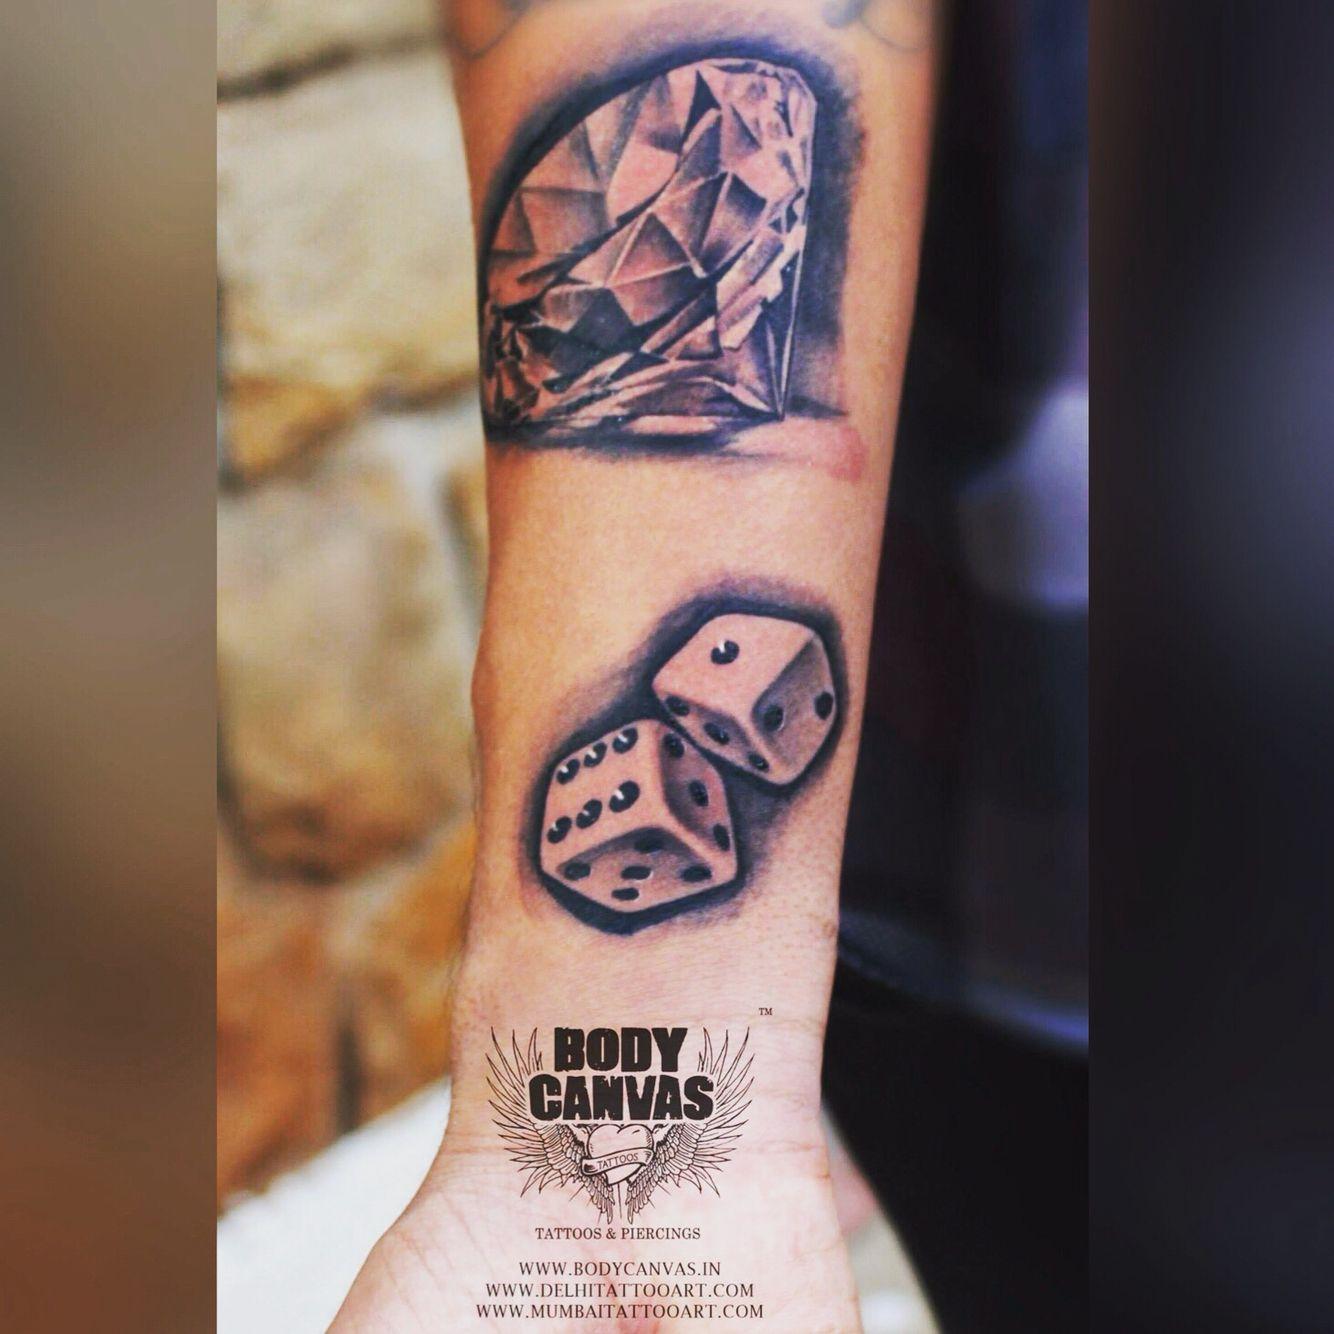 Small Money Bag Tattoo: #diamond Tattoos #dice Tattoos